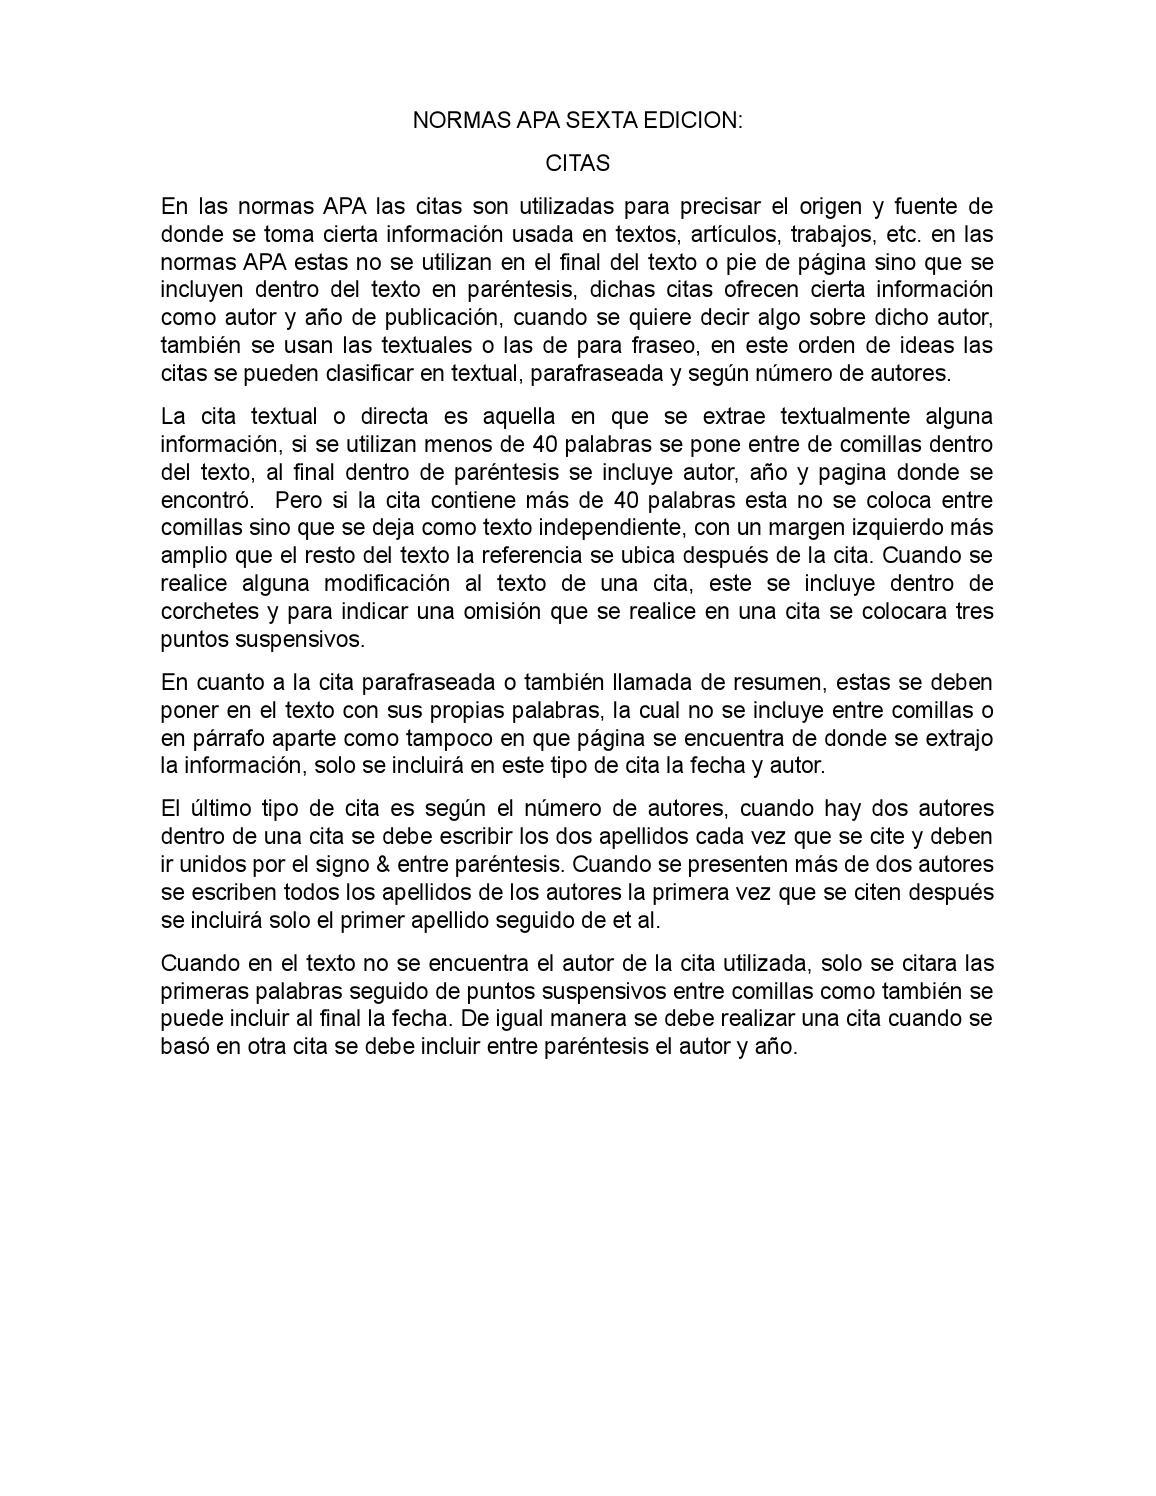 Colorful Resumen Normas Apa 6 Motif - Professional Resume Examples ...